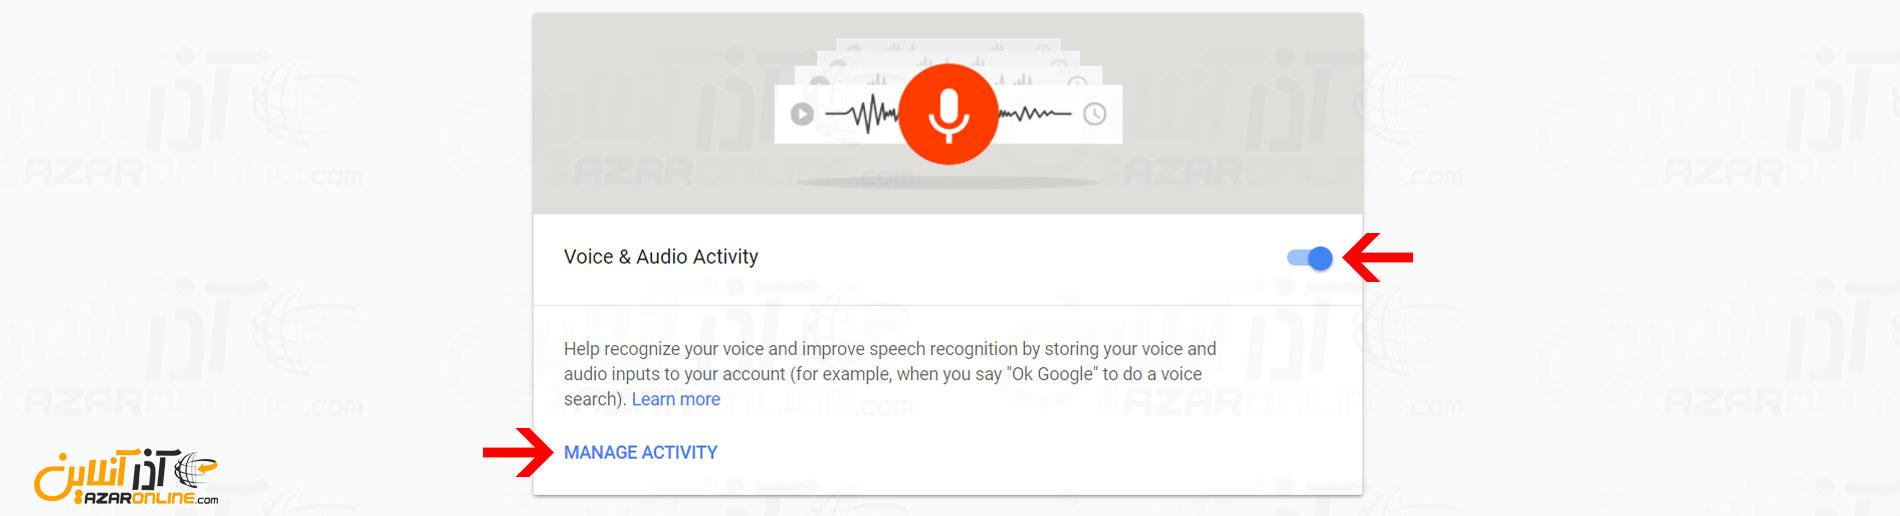 فعالیت Voice و گفتارها